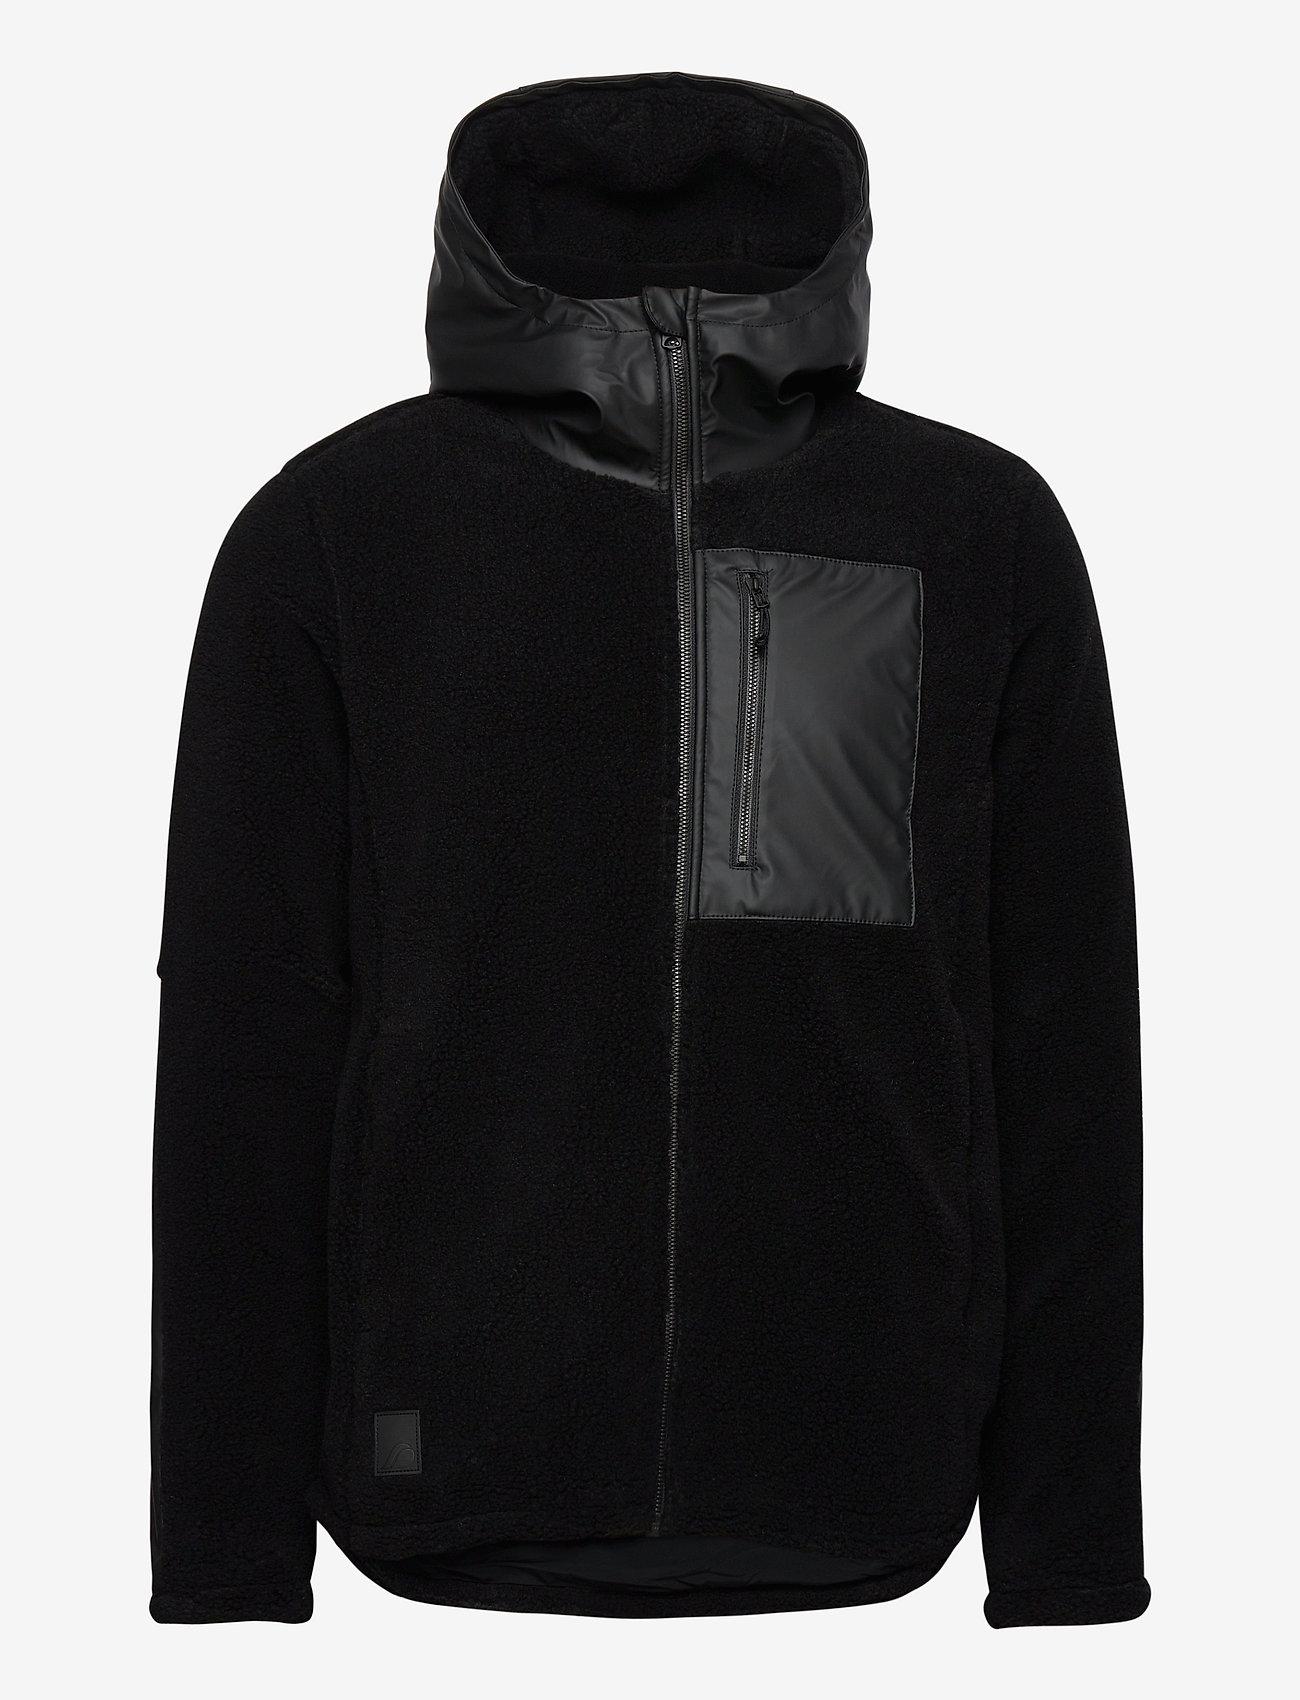 Didriksons - BOSSE USX JKT 2 - basic-sweatshirts - black - 1